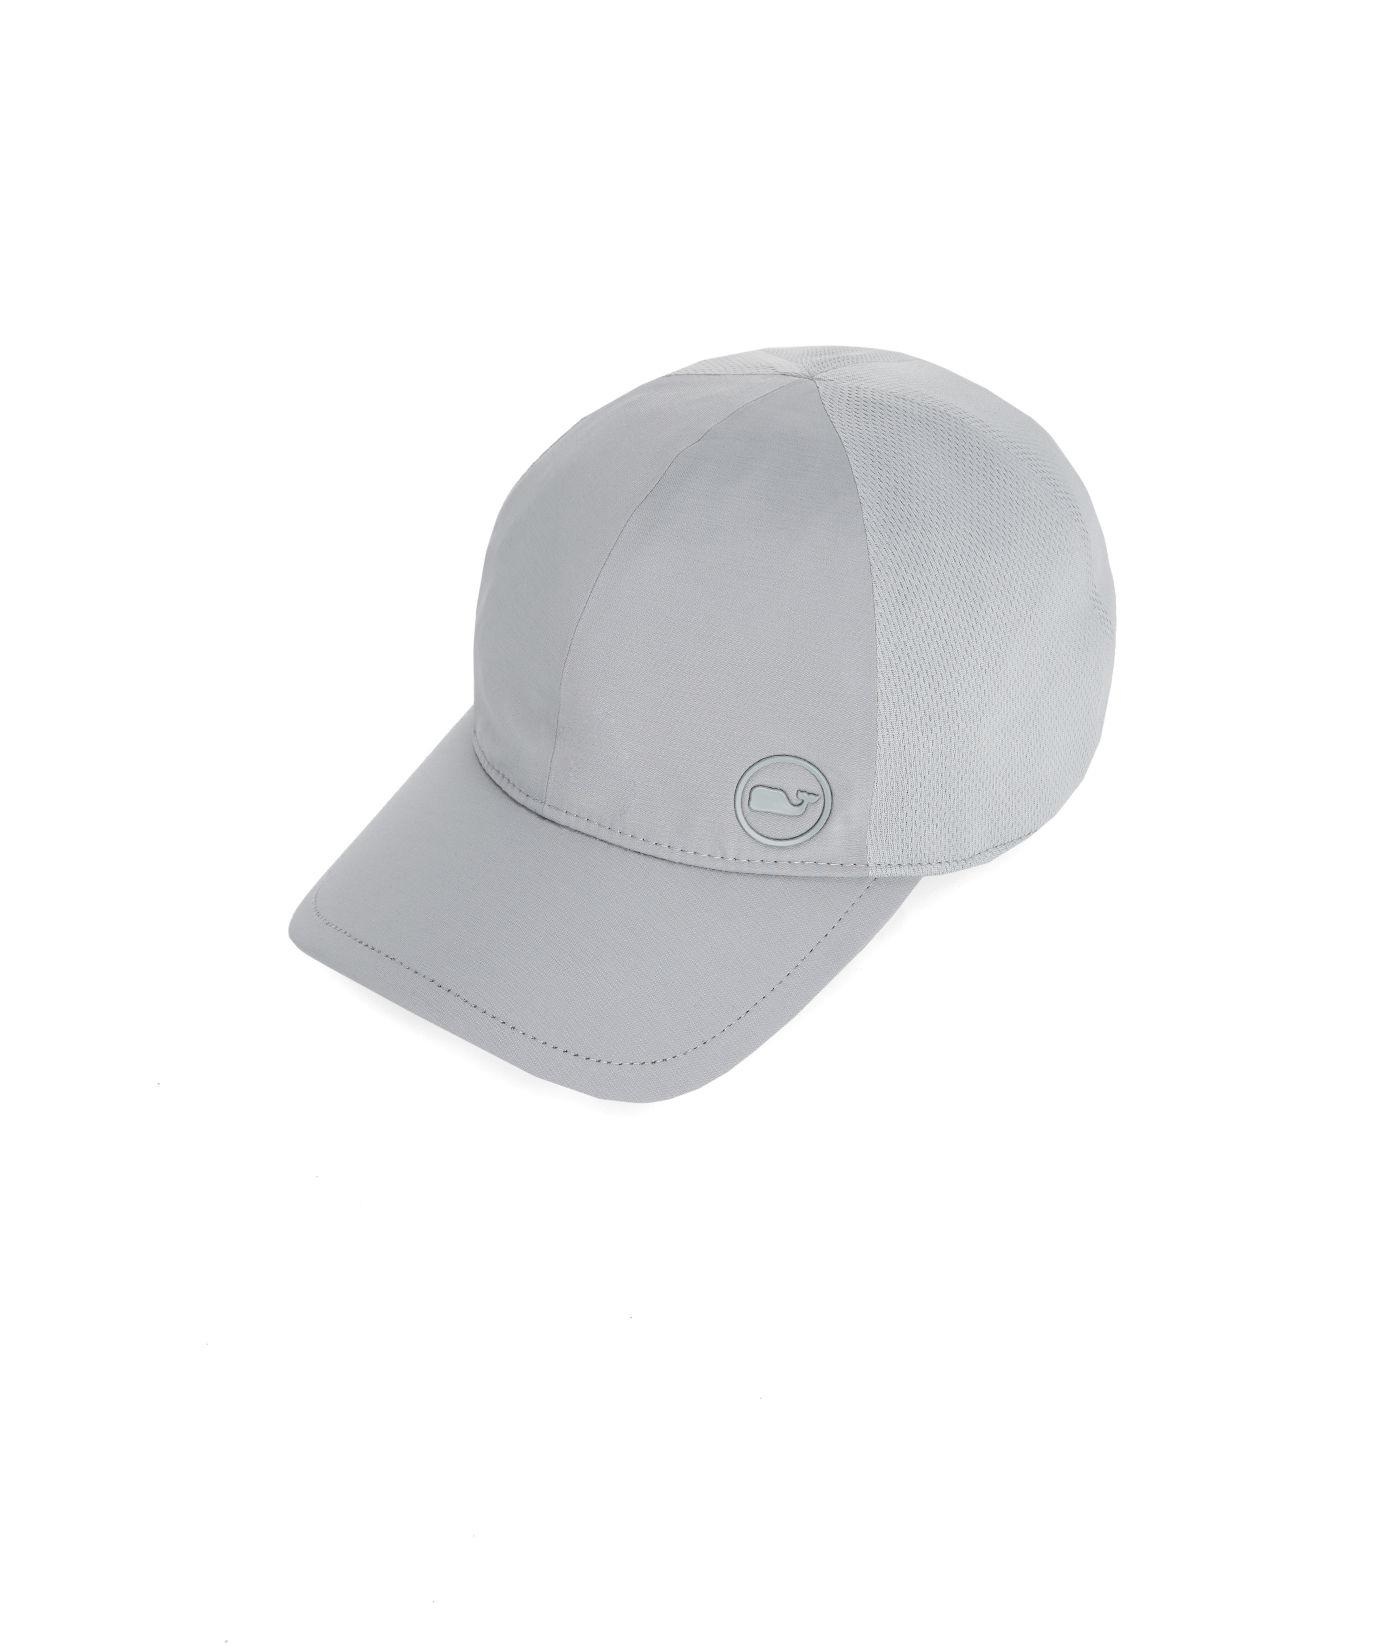 b095e14c295 Lyst - Vineyard Vines Performance Mesh Whale Dot Trucker Hat in Gray ...